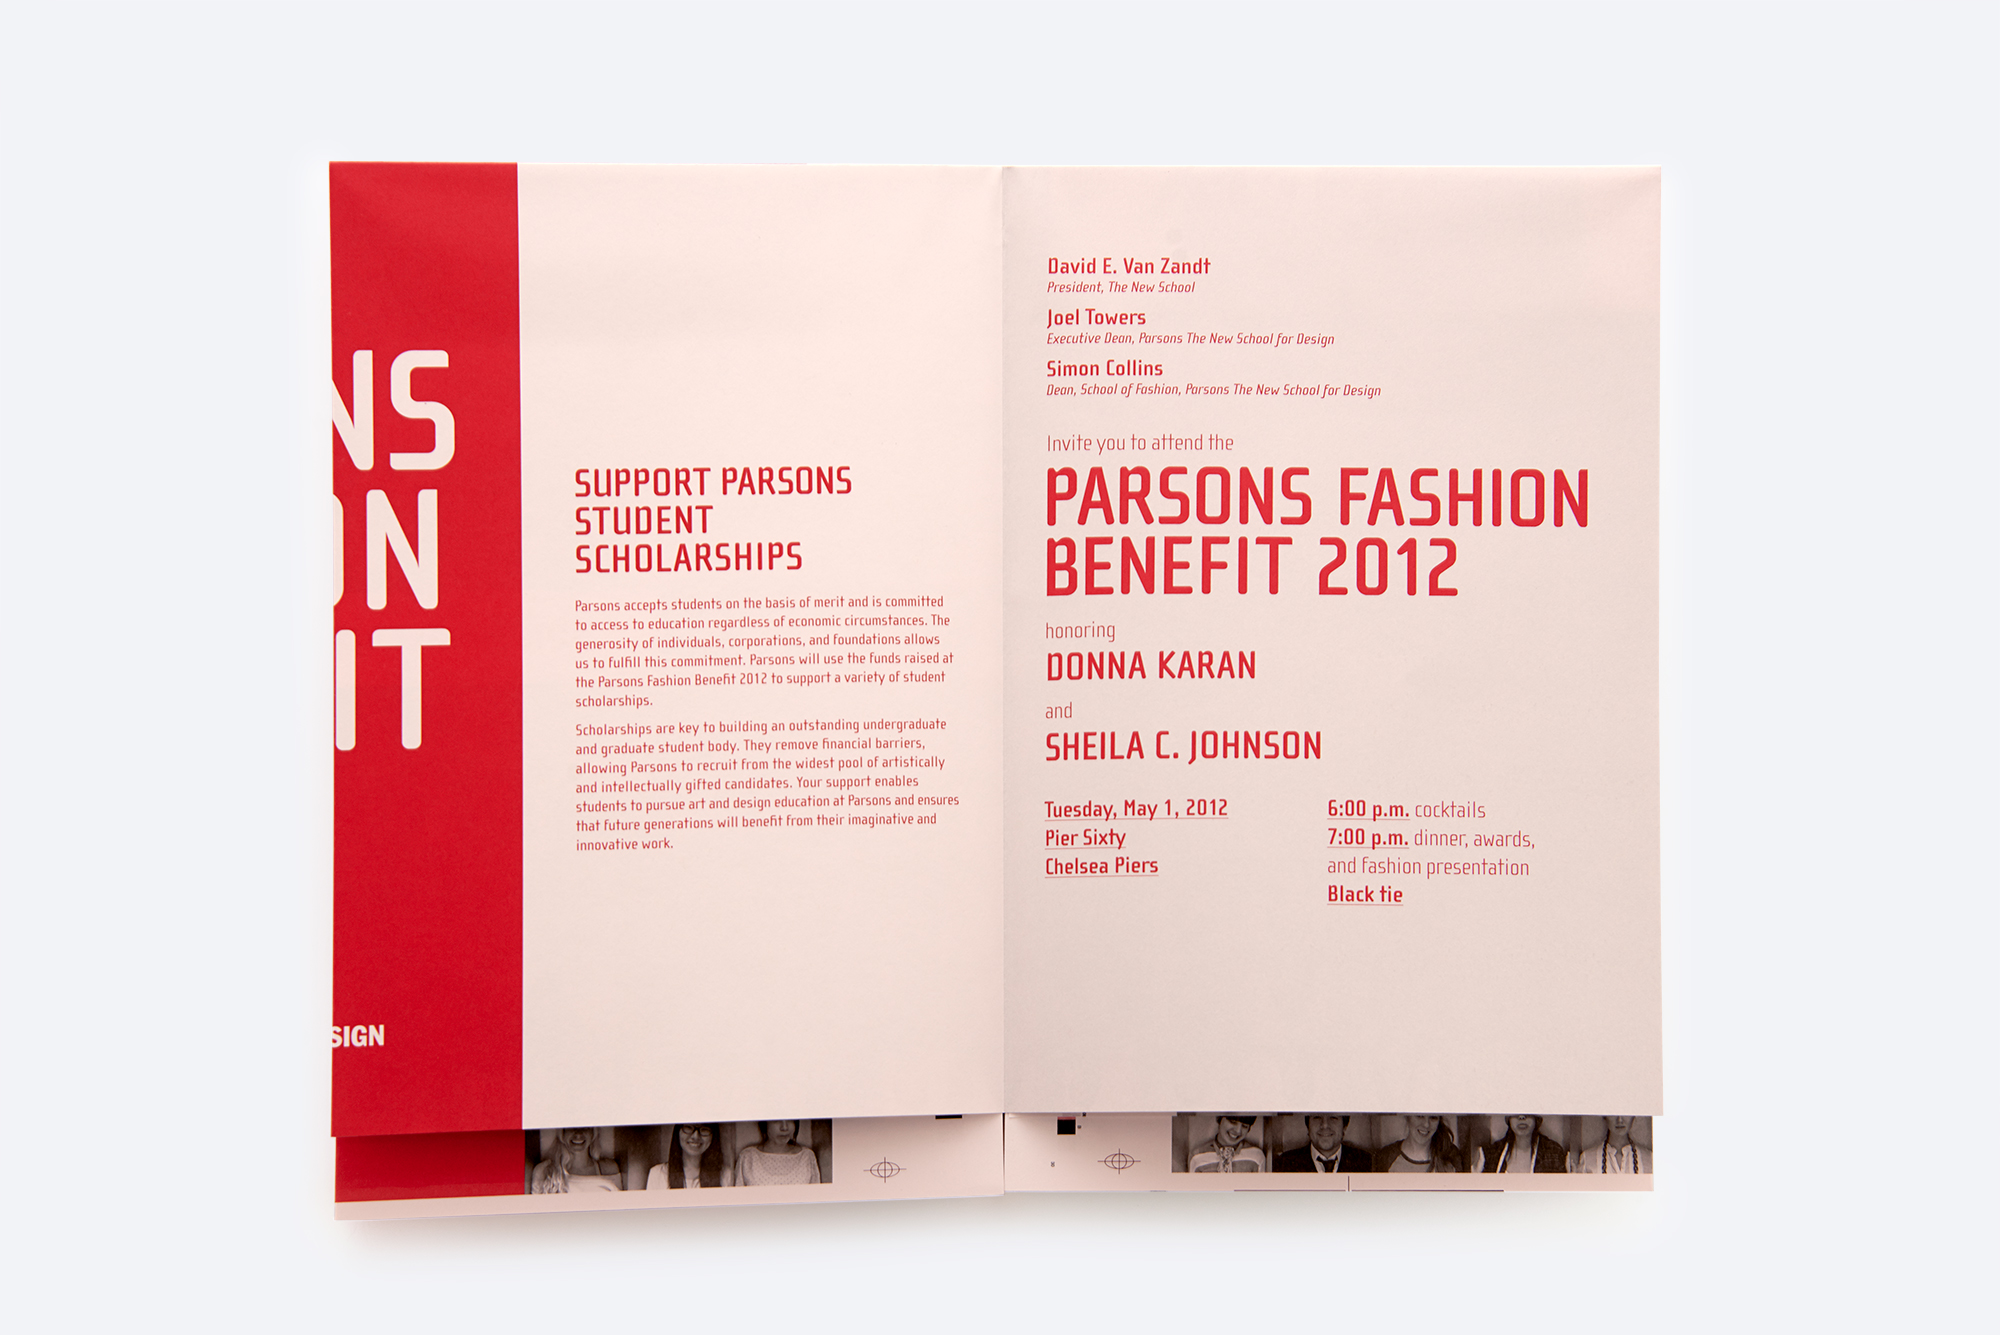 Paula_Giraldo_Parsons_Fashion_Benefit_7.jpg